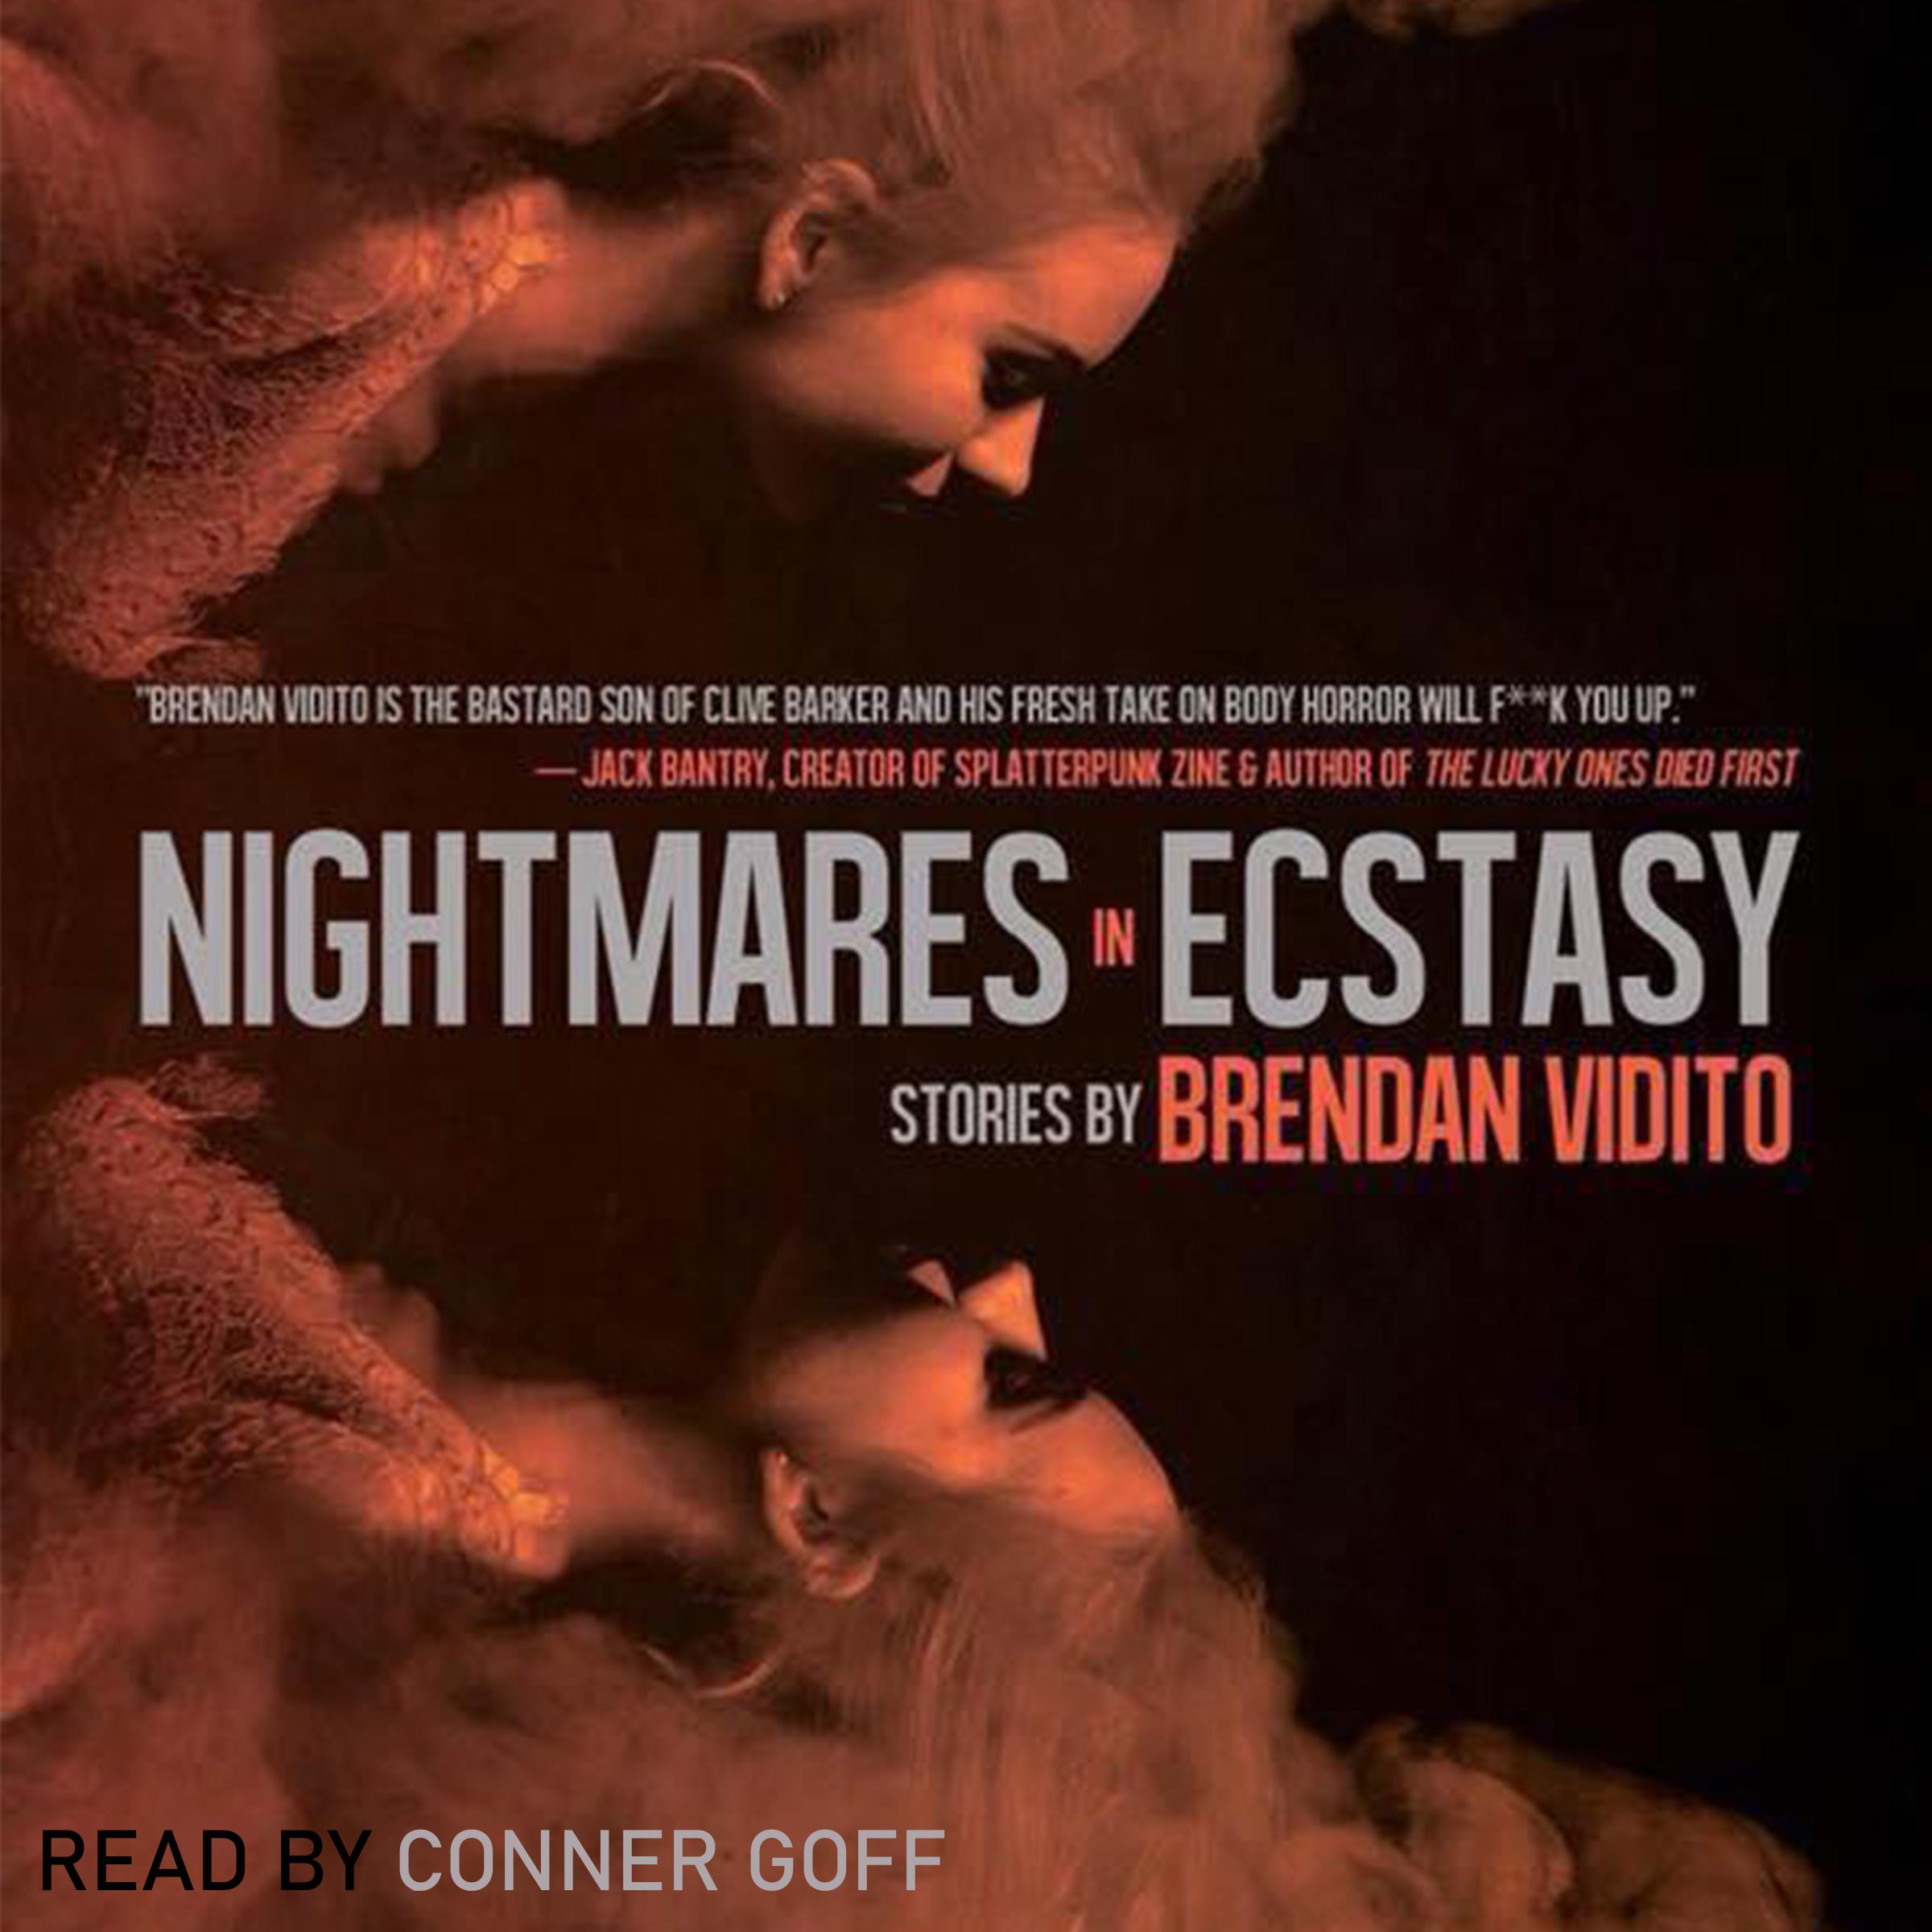 NightmaresInEcstasy_AudiblePic_Black.Grey.Corner